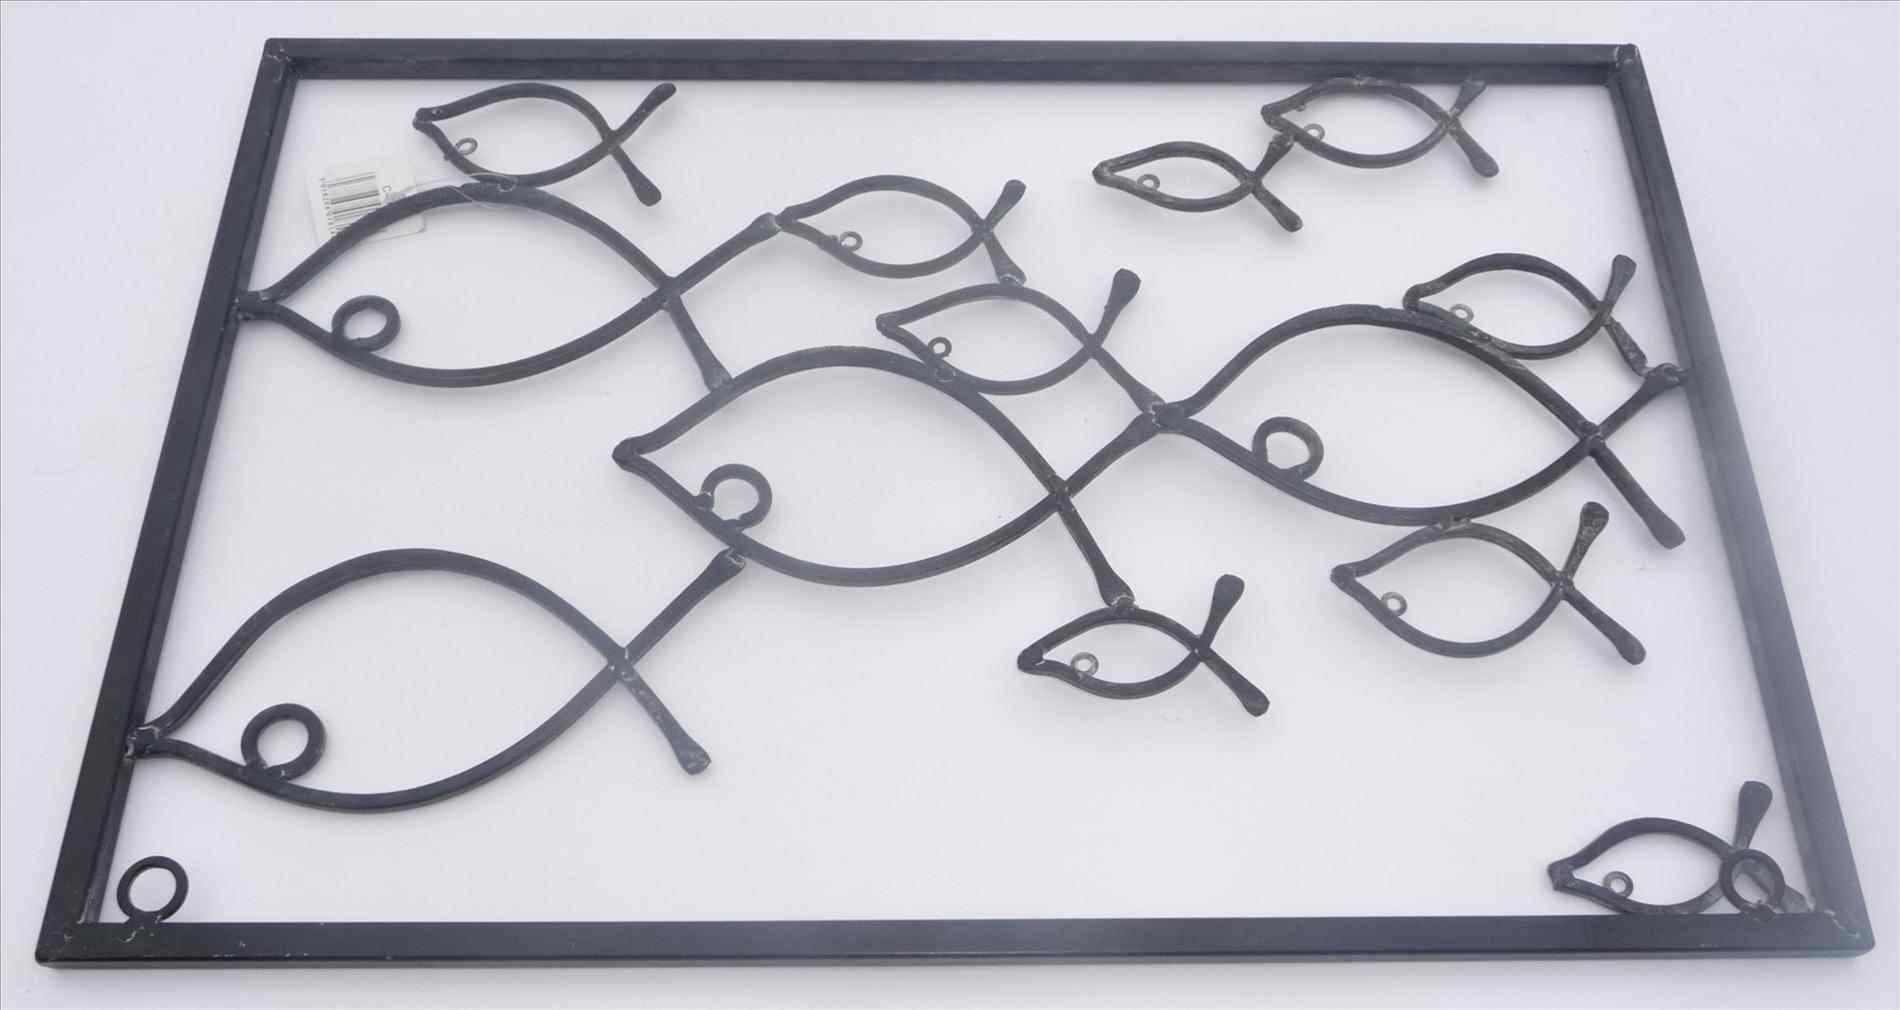 Metal Wall Art Fish Shoal | Home Interior Decor With Regard To 2018 Fish Shoal Metal Wall Art (Gallery 30 of 30)